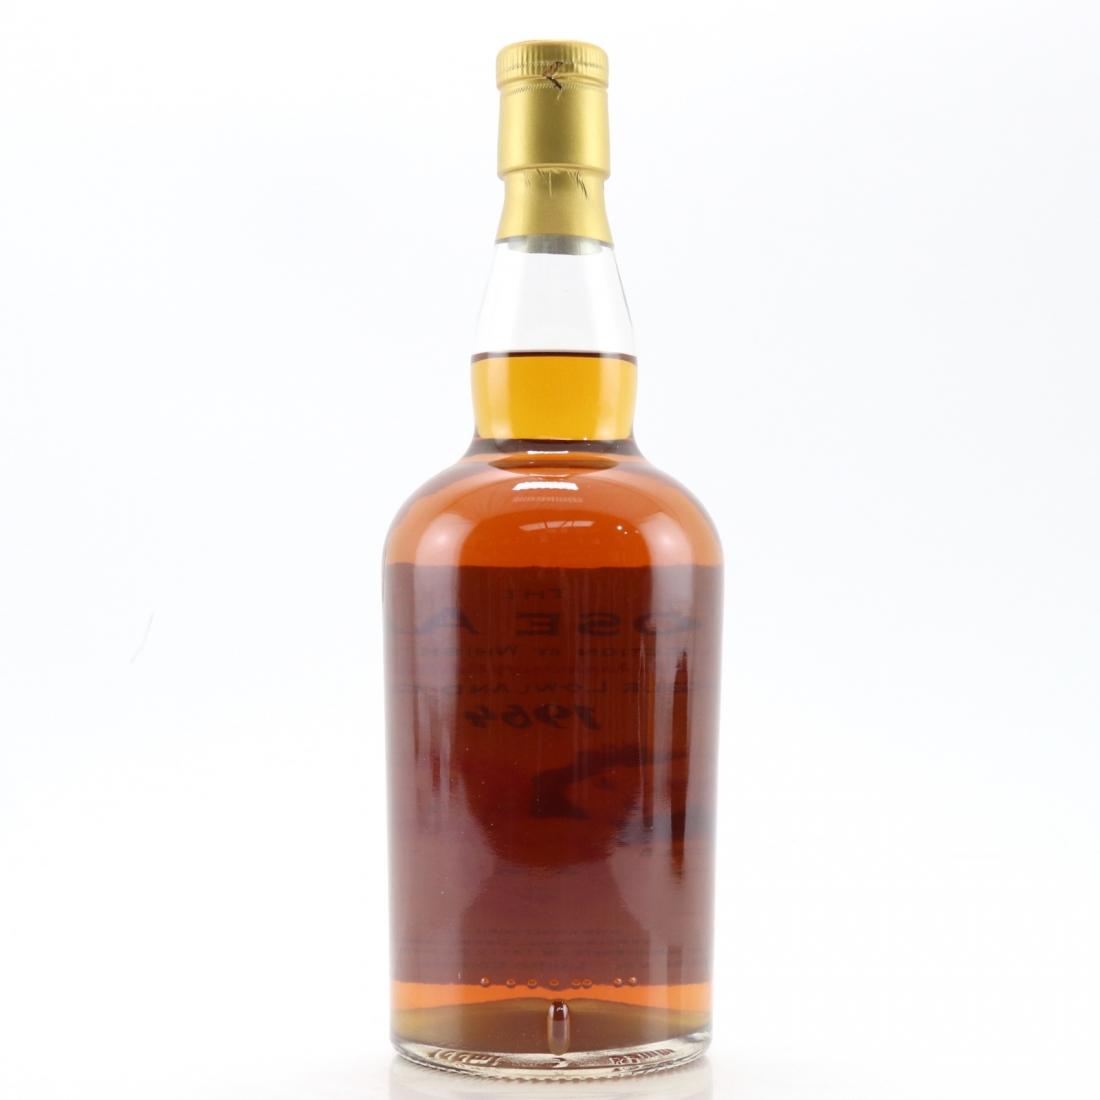 Lowland Single Grain 1964 Whisky Doris 50 Year Old / Nose Art